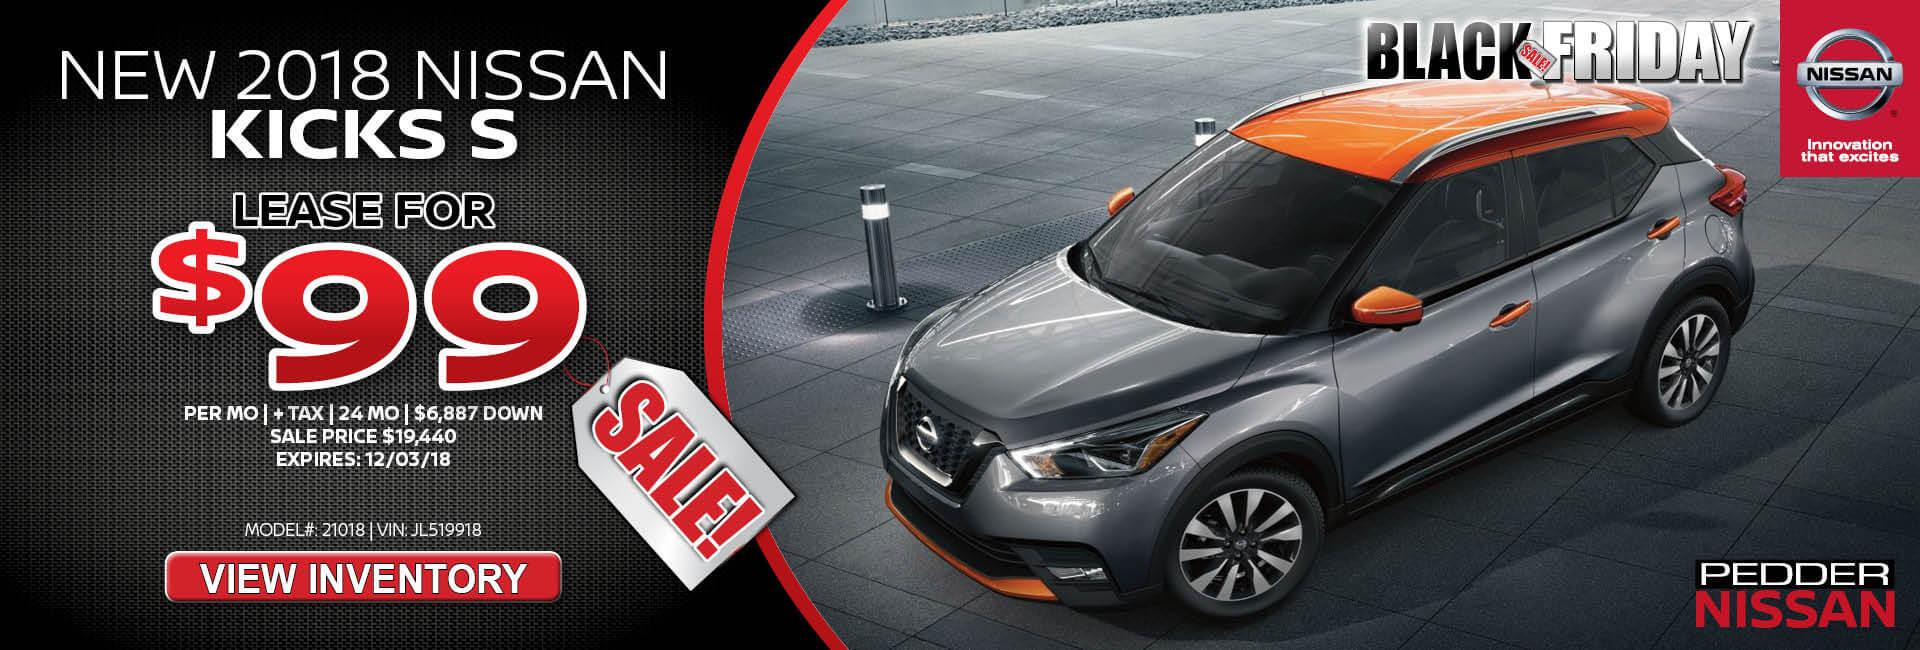 Nissan Kicks $99 Lease